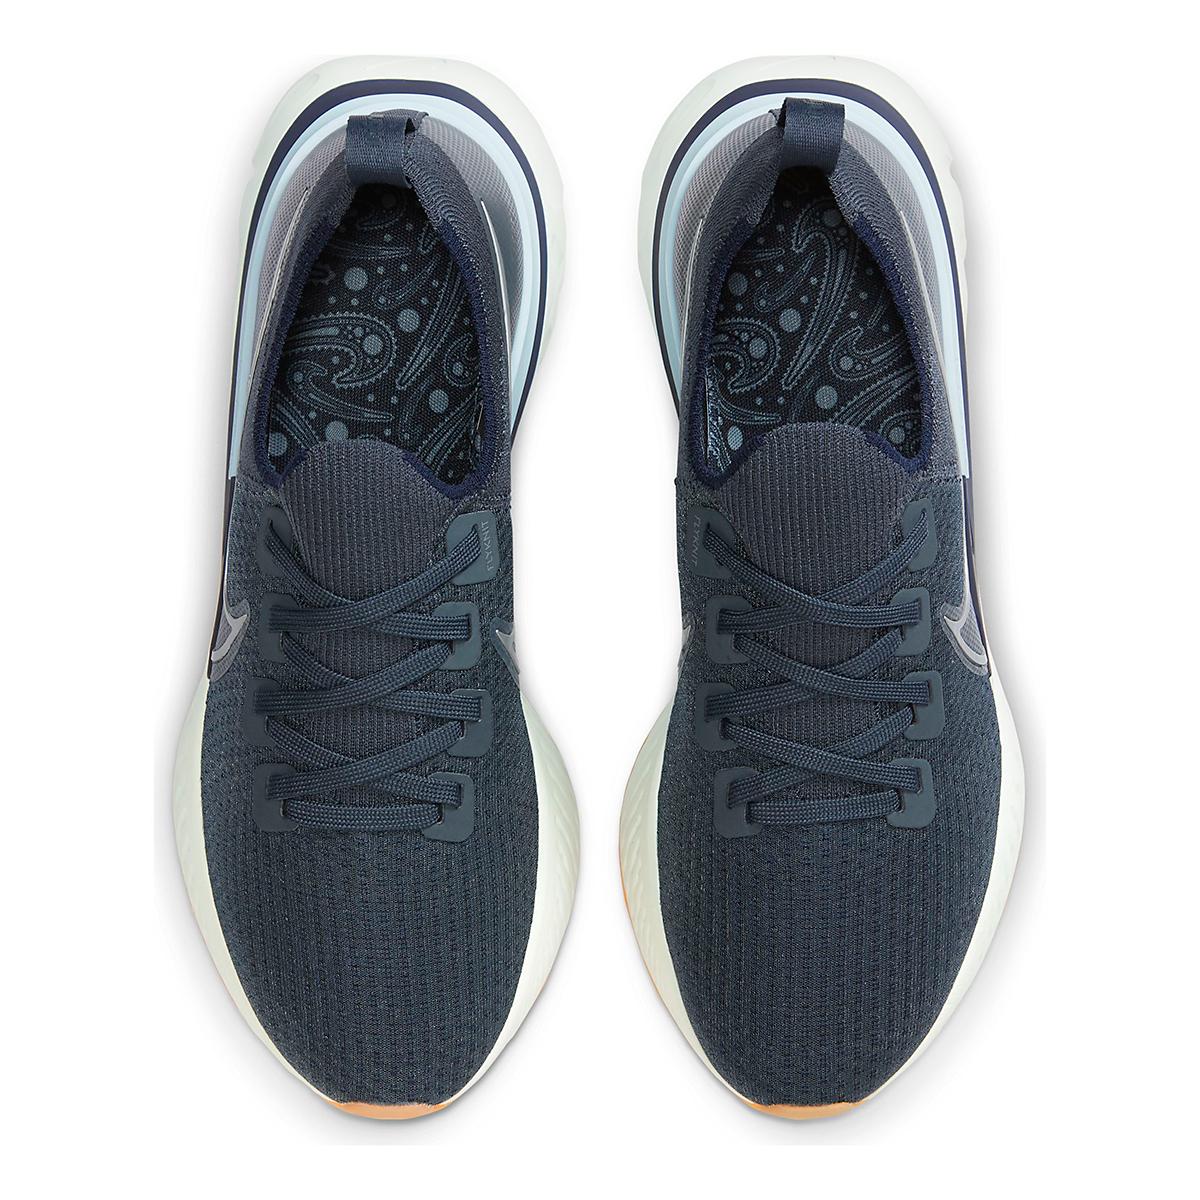 Men's Nike React Infinity Run Flyknit Running Shoe - Color: Blue Fox/Metallic Silver - Size: 6 - Width: Regular, Blue Fox/Metallic Silver, large, image 4